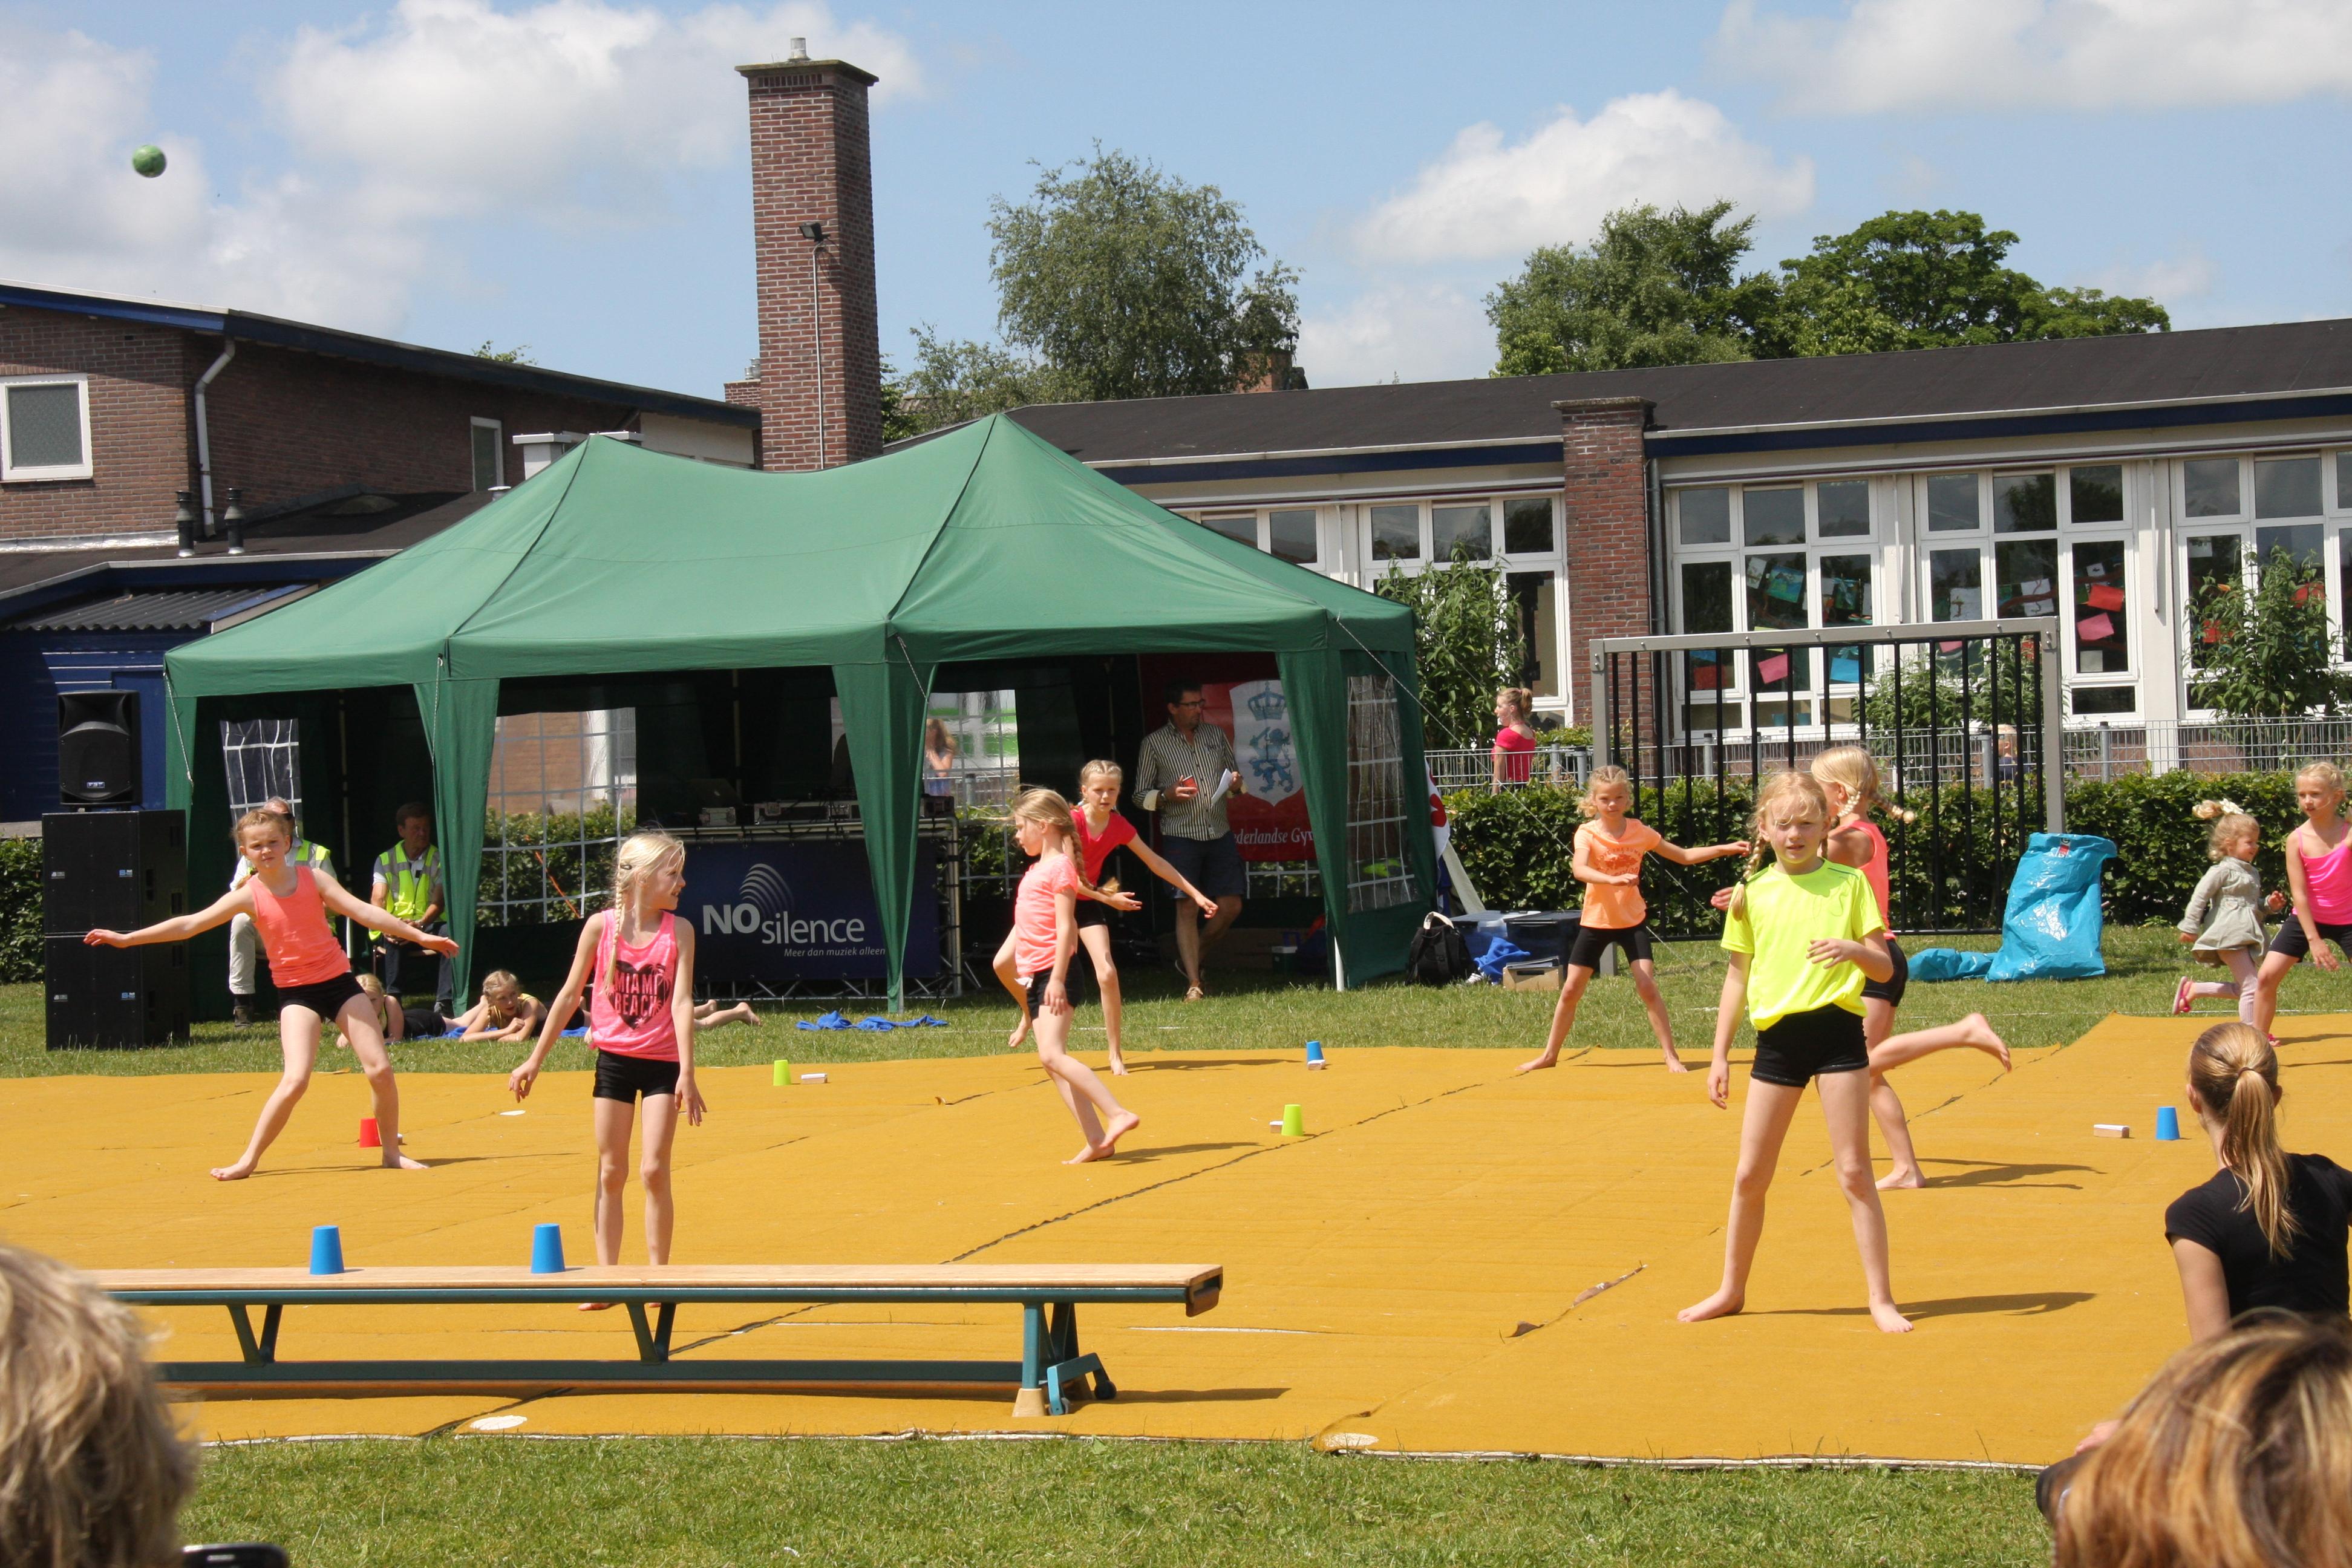 gymnastiekuitvoering-juni-2015-015